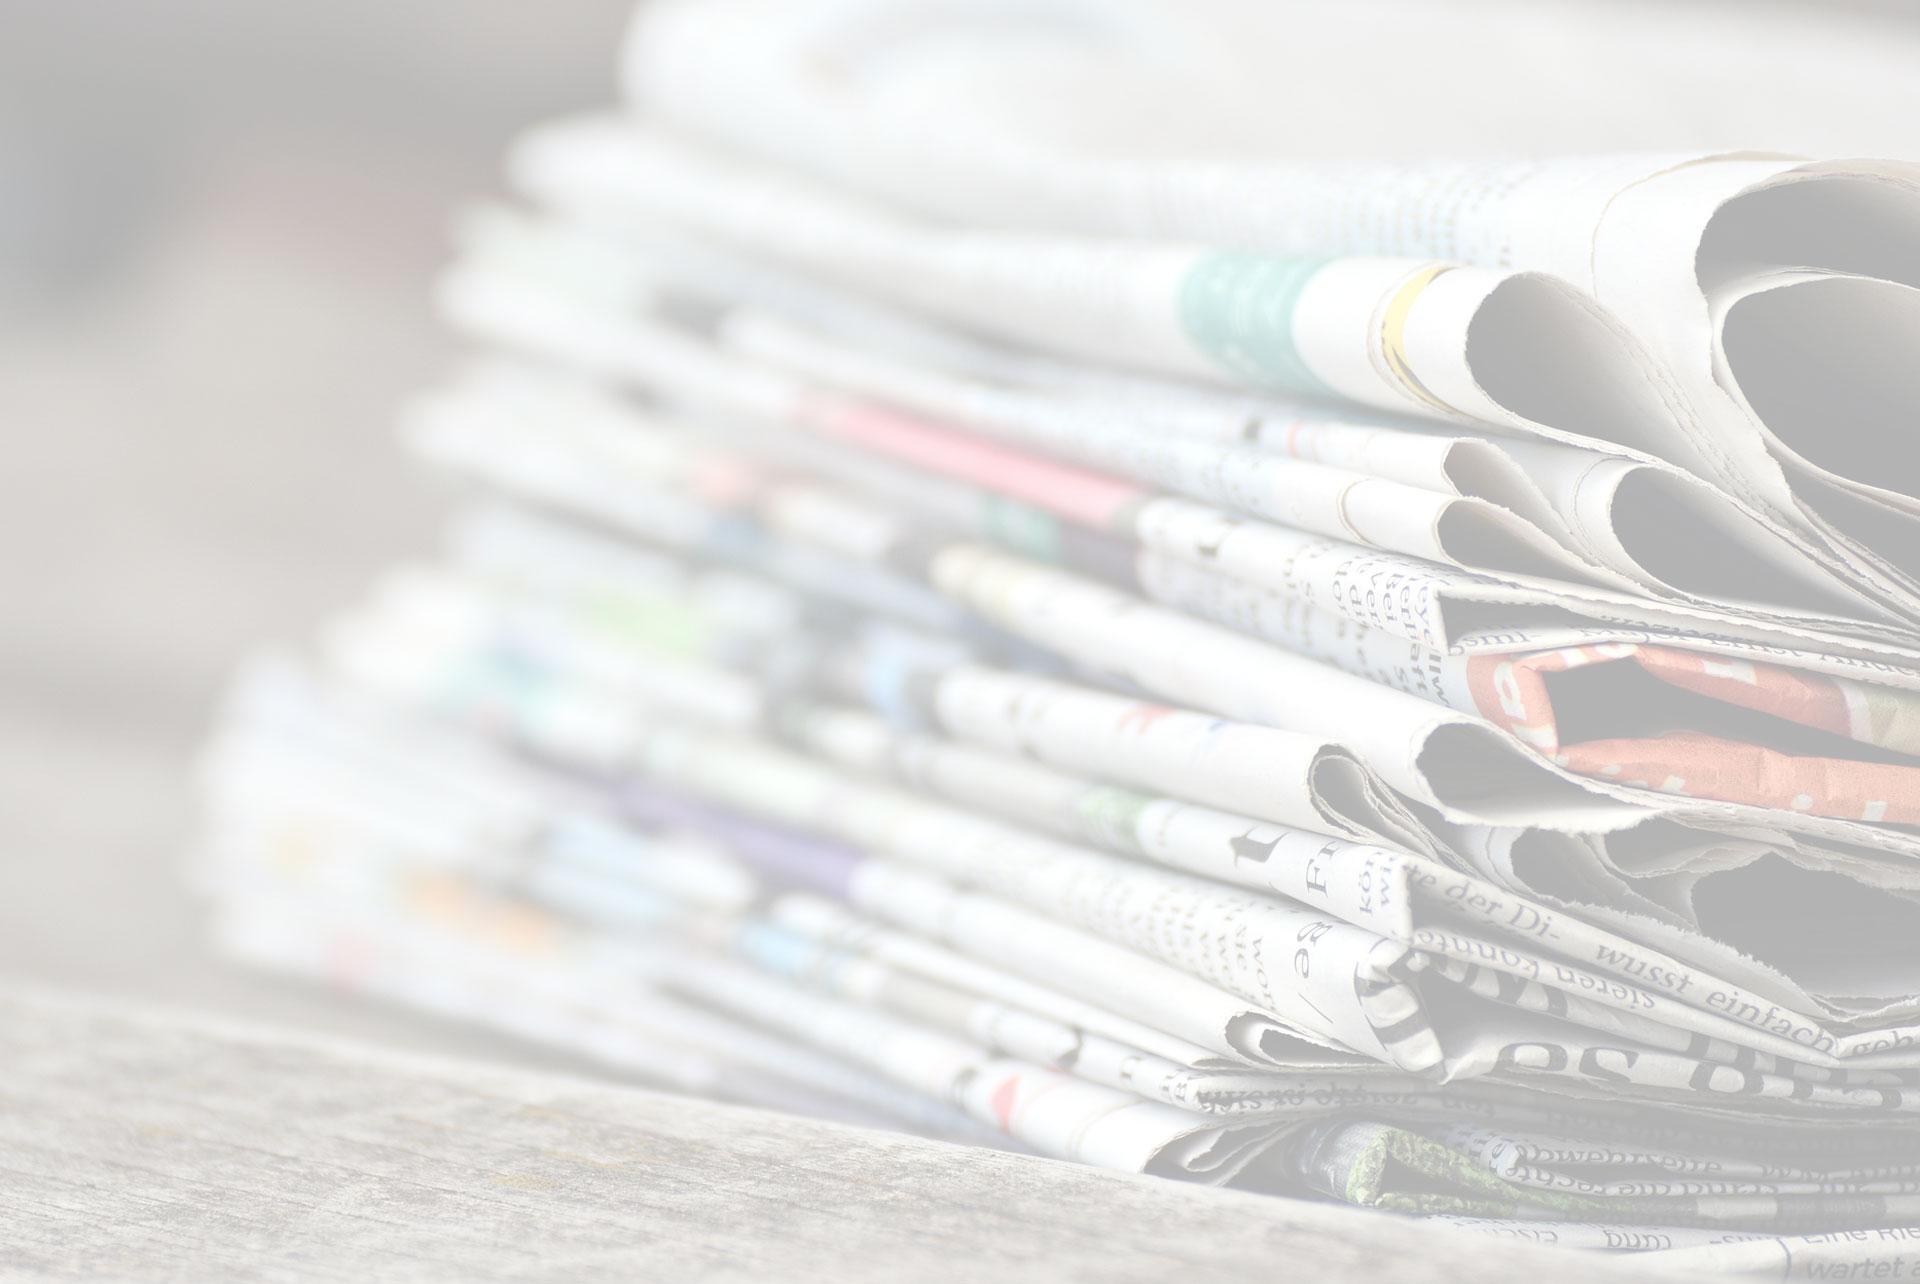 Israele diventa per legge